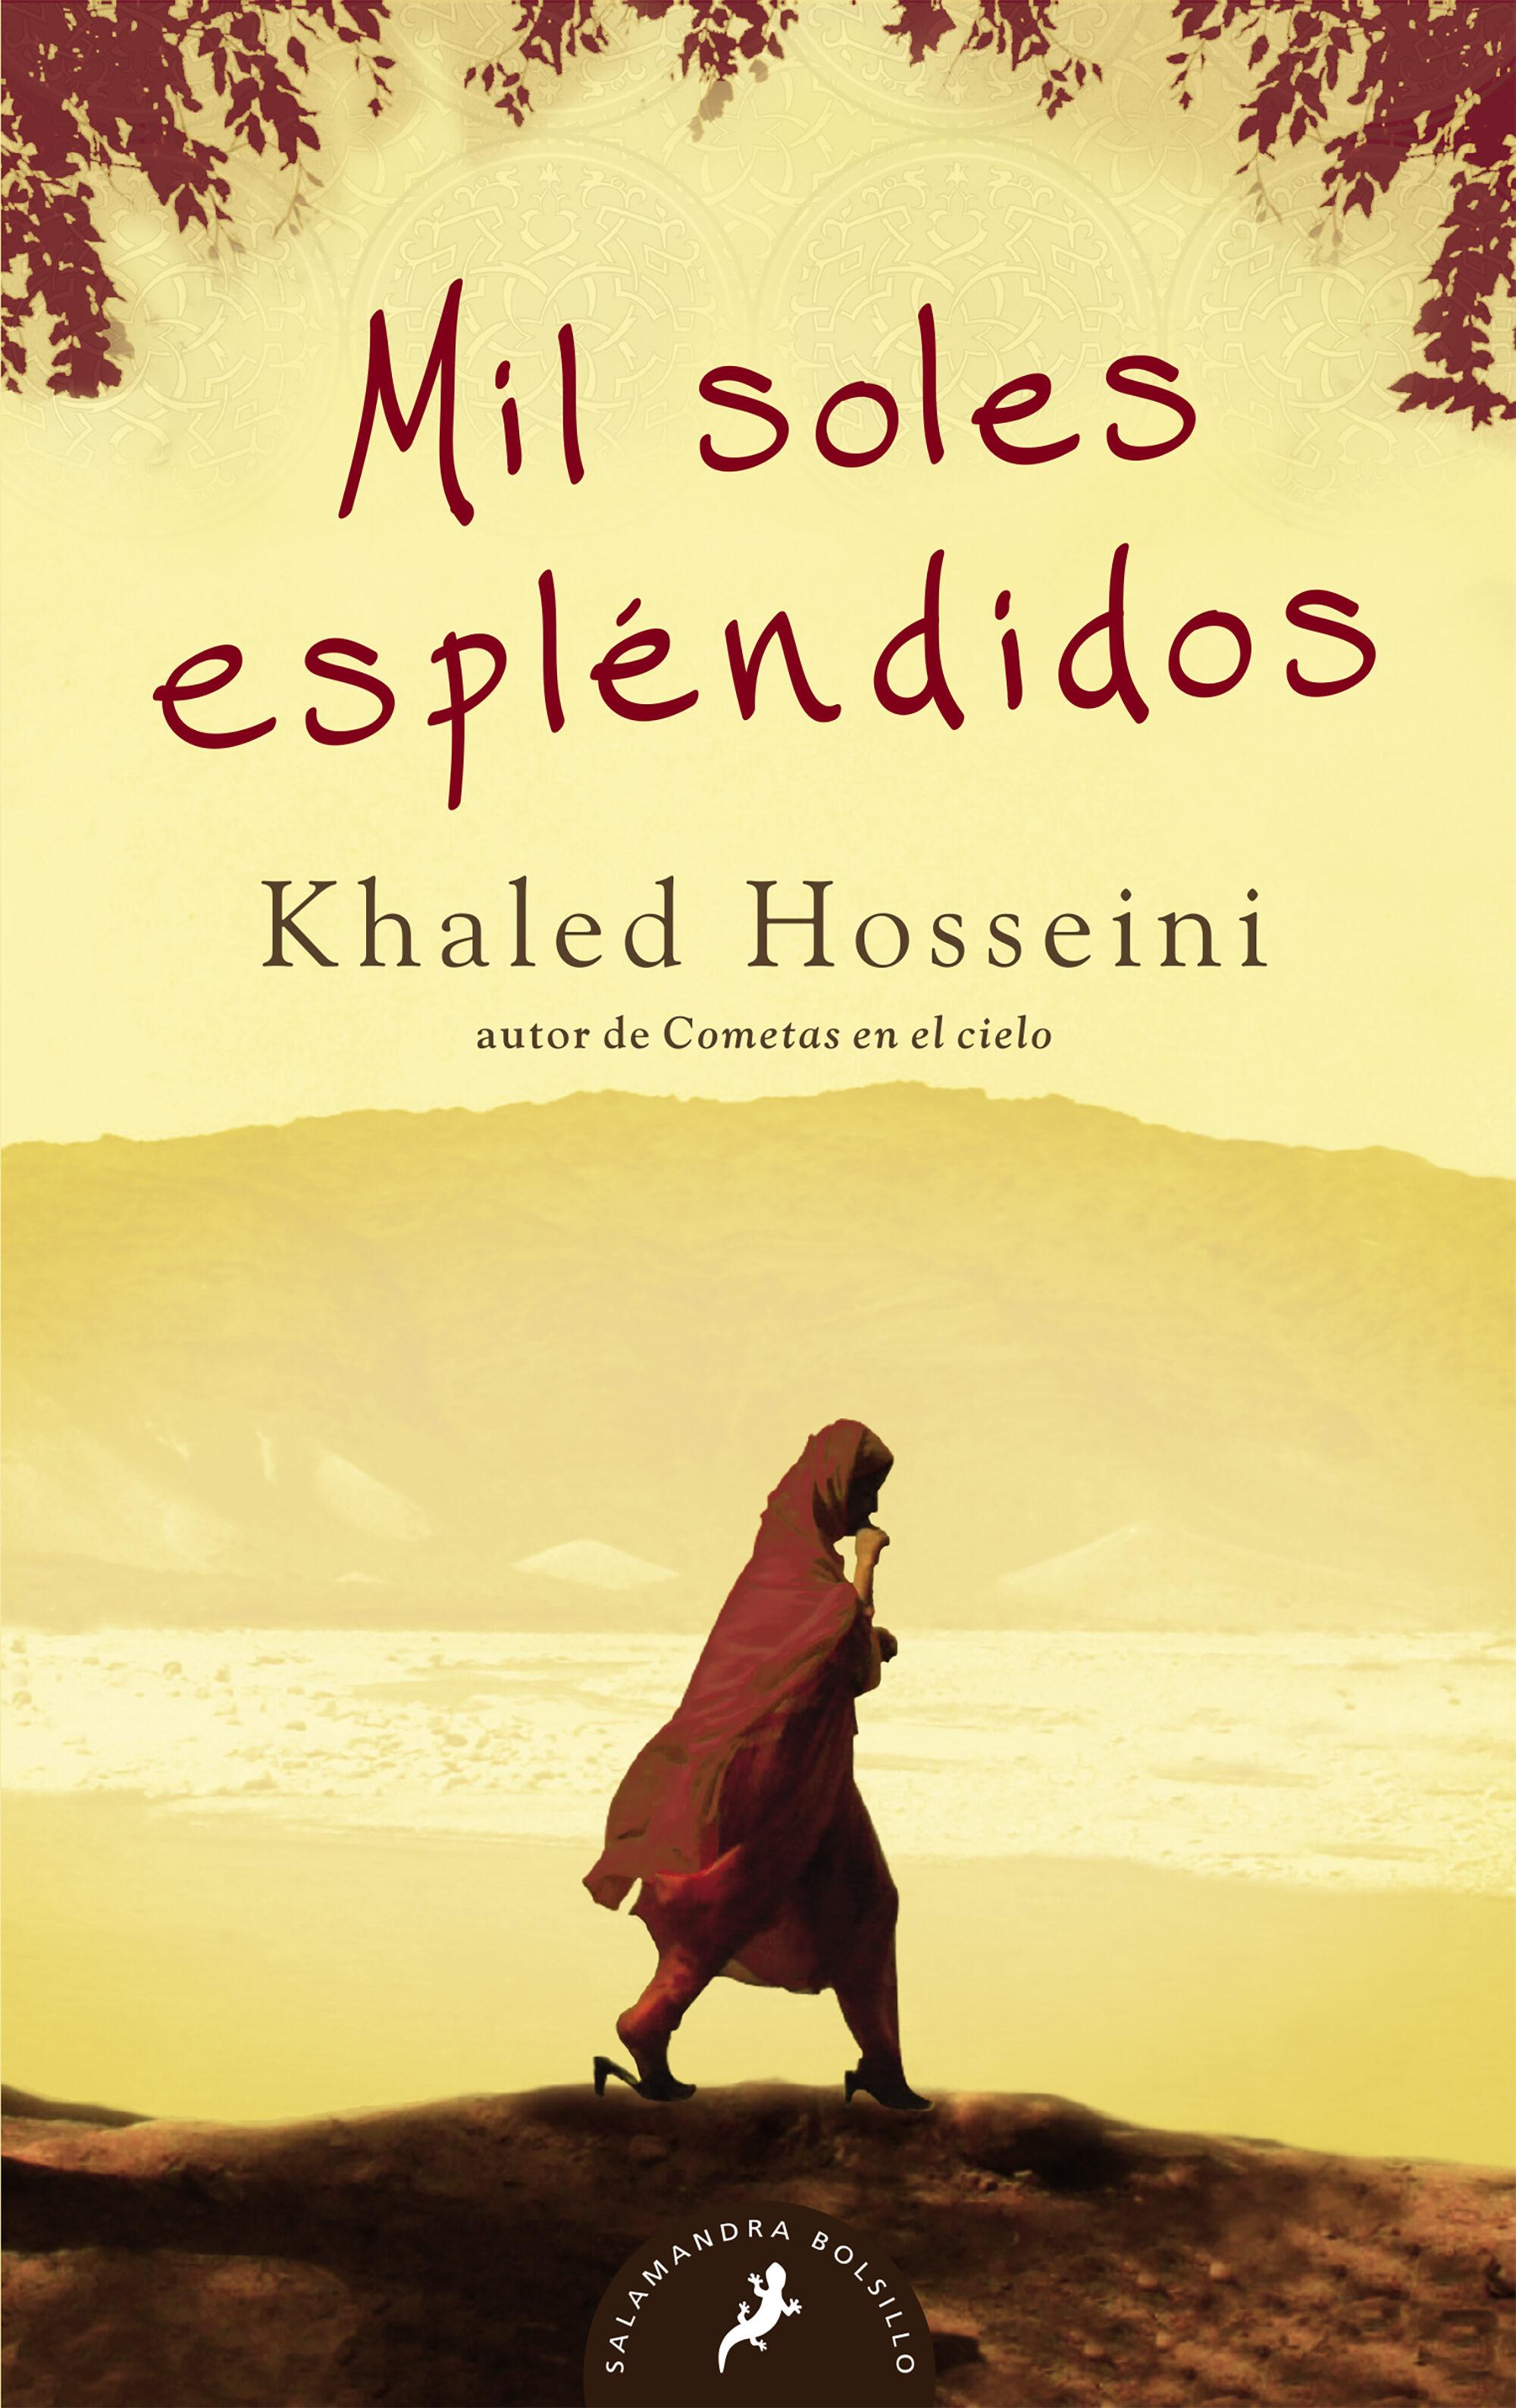 Mil Soles Esplendidos por Khaled Hosseini